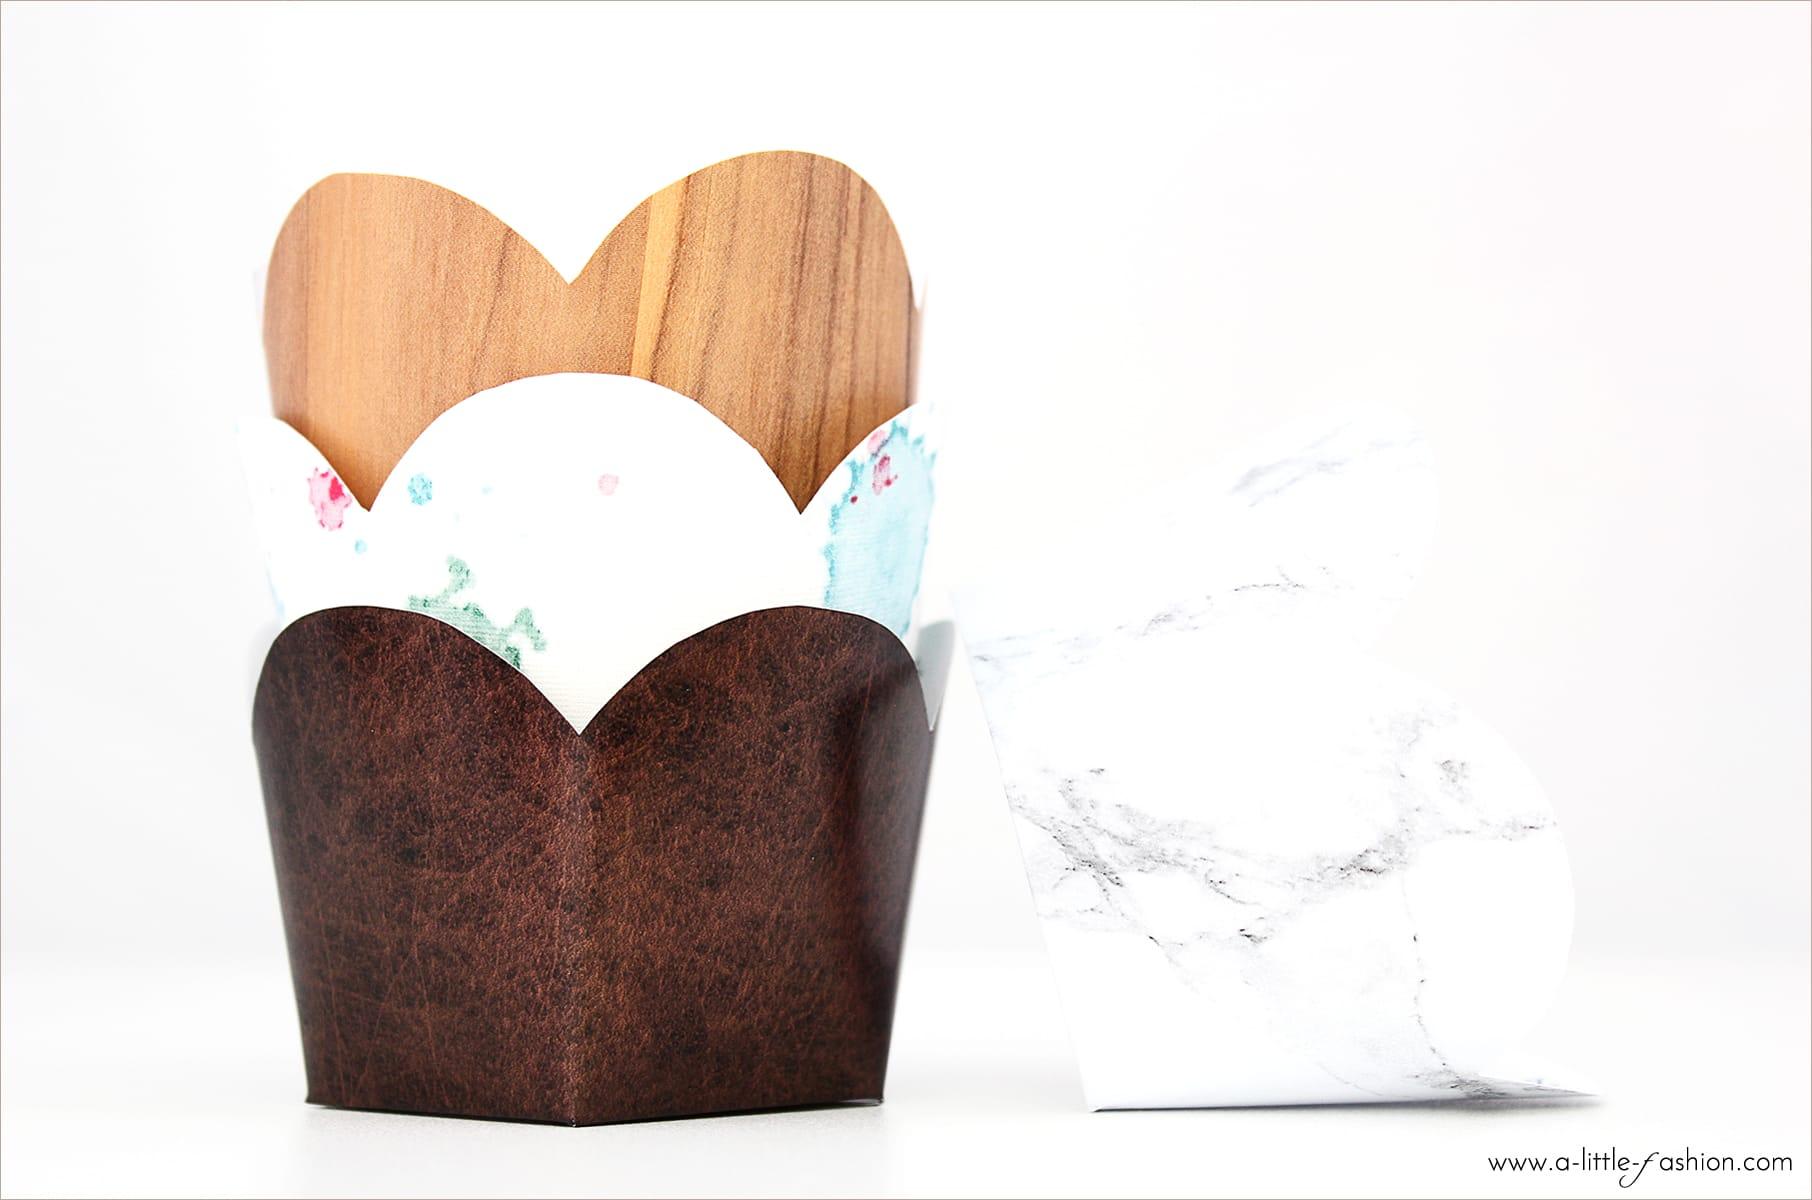 muffin f rmchen in wunschdesign selber machen a little fashion der kreativbloga little. Black Bedroom Furniture Sets. Home Design Ideas